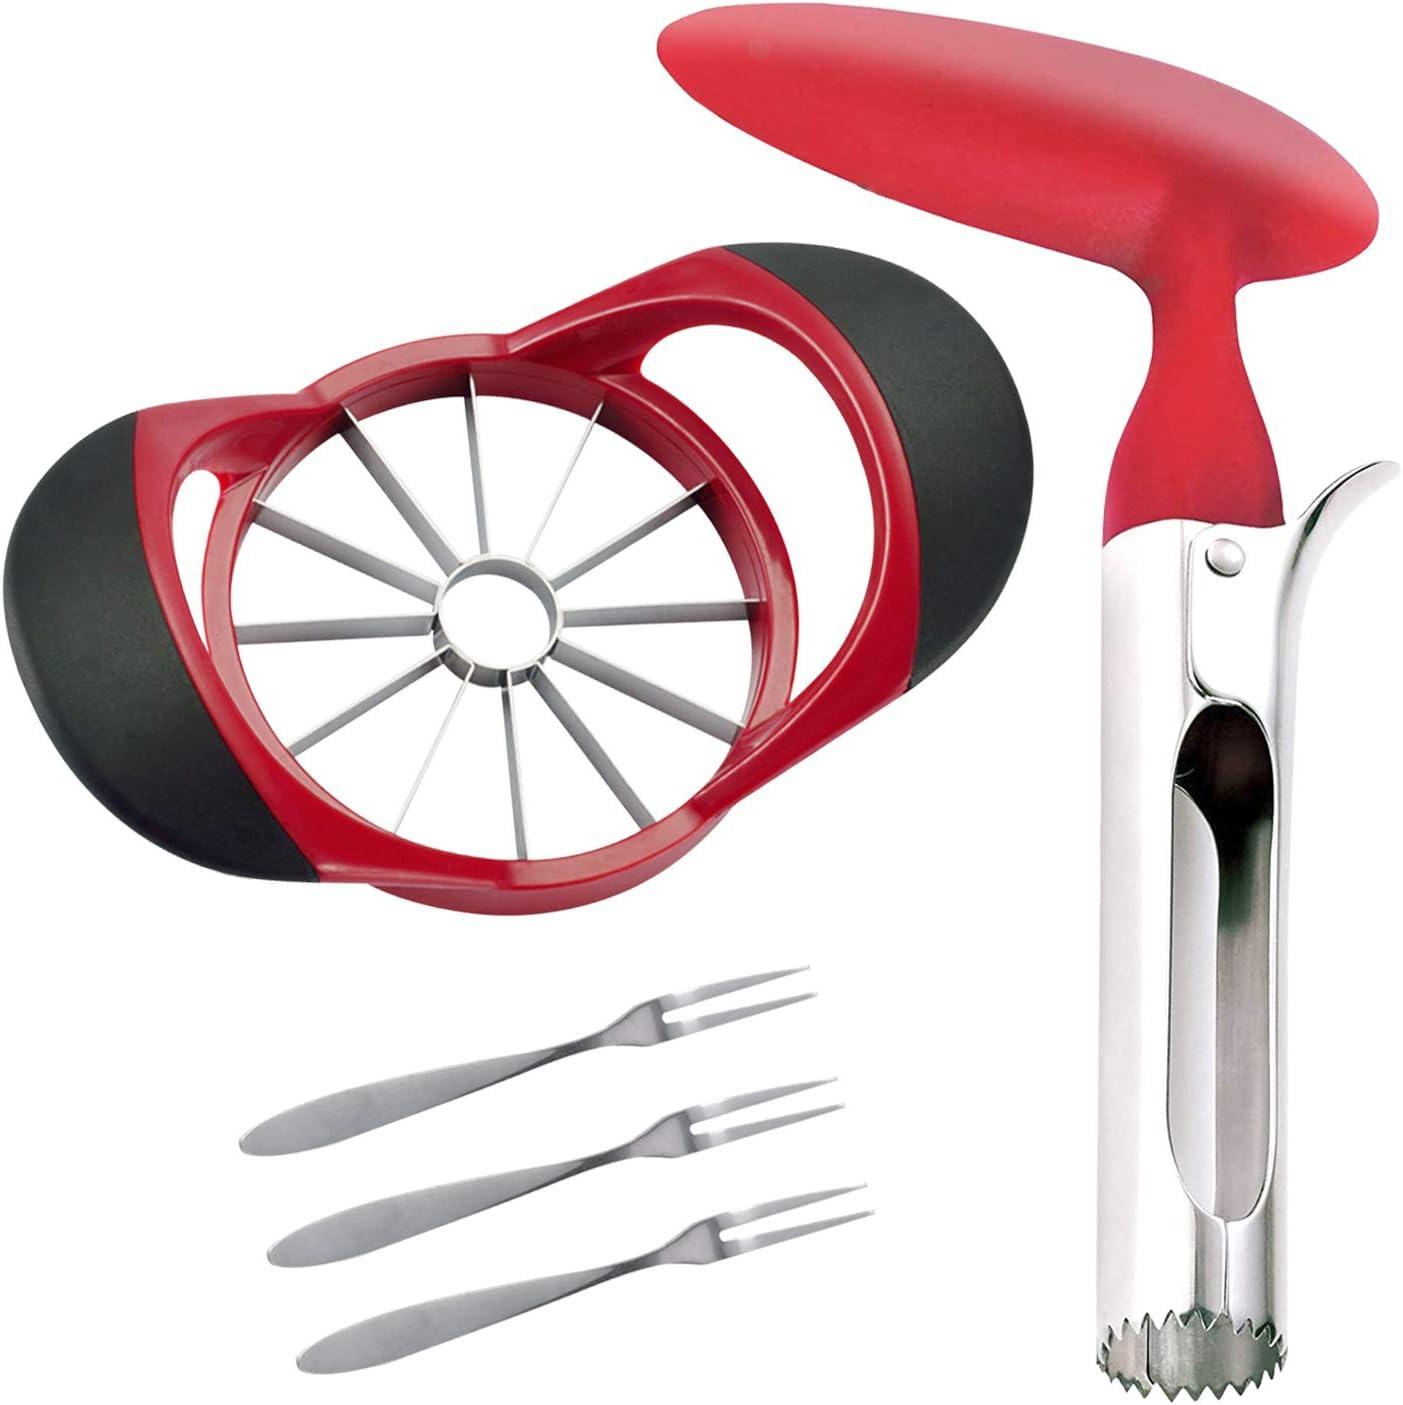 SINGARE Apple Cutter Slicer & Corer Kit, 12-Blade Apple Slicer Cutter, Apple Corer Apple Core Remover for Kitchen, Include 3 Premium Stainless Steel Fruit Forks